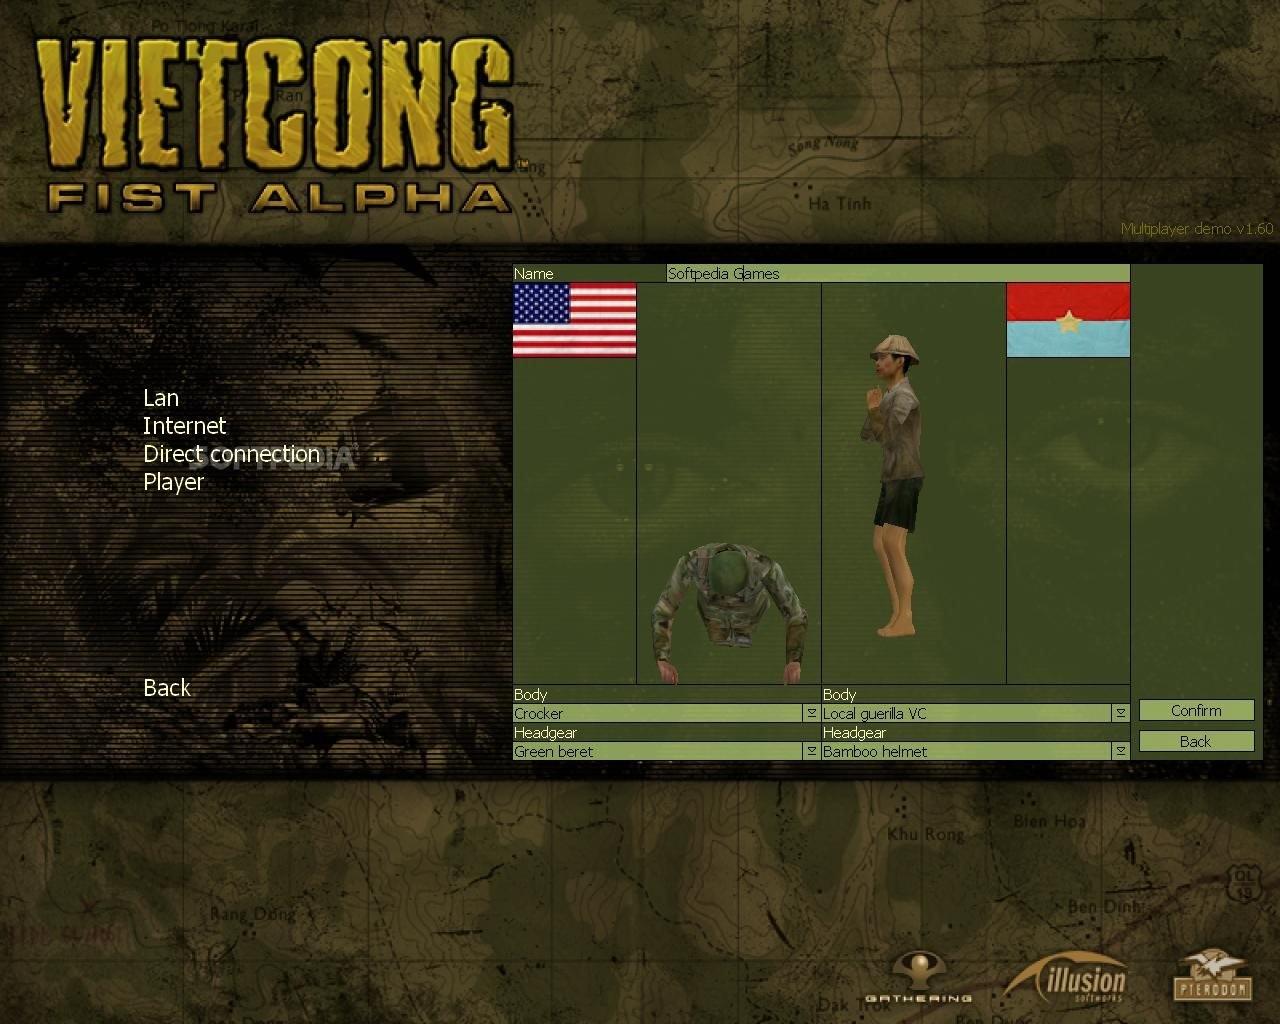 Vietcong fist alpha multiplayer demo for